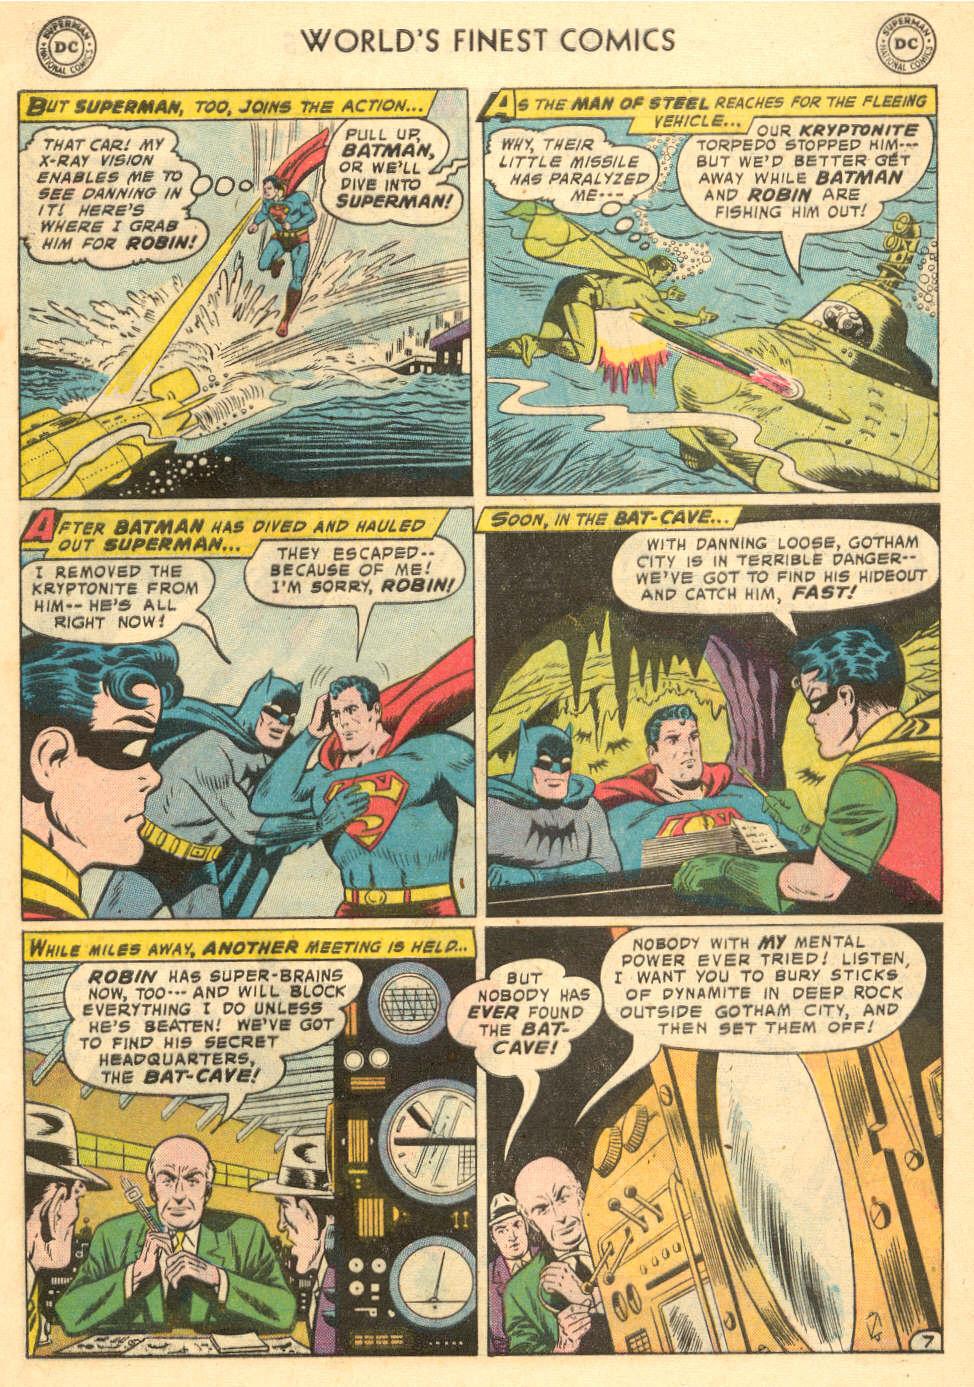 Read online World's Finest Comics comic -  Issue #93 - 9